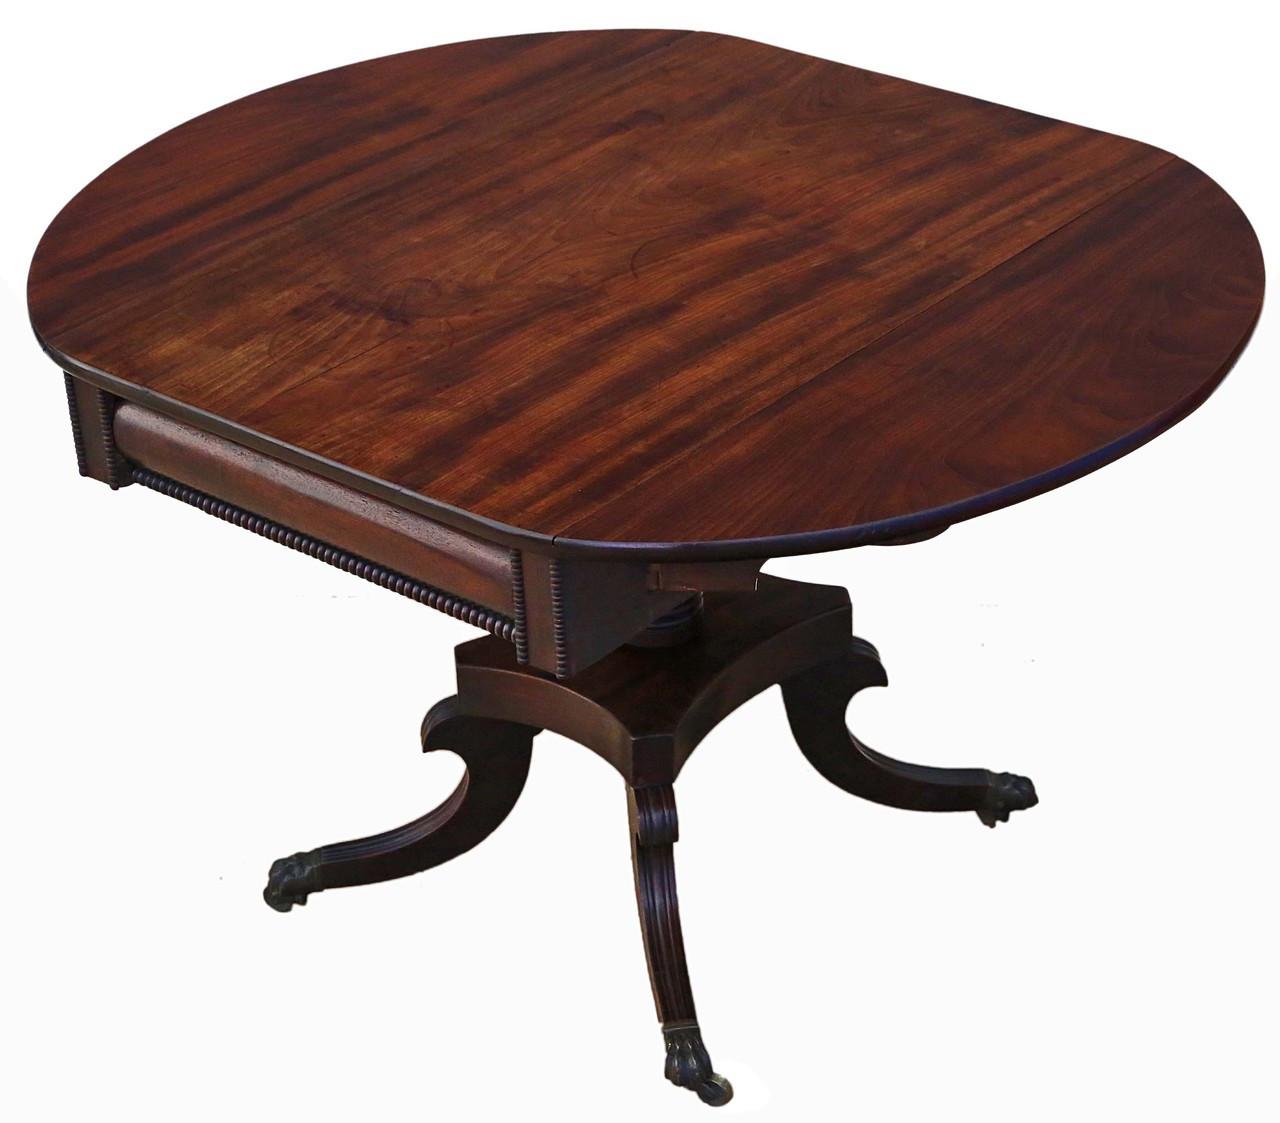 Fine Antique Quality Georgian Regency Mahogany Pedestal Pembroke Andrewgaddart Wooden Chair Designs For Living Room Andrewgaddartcom